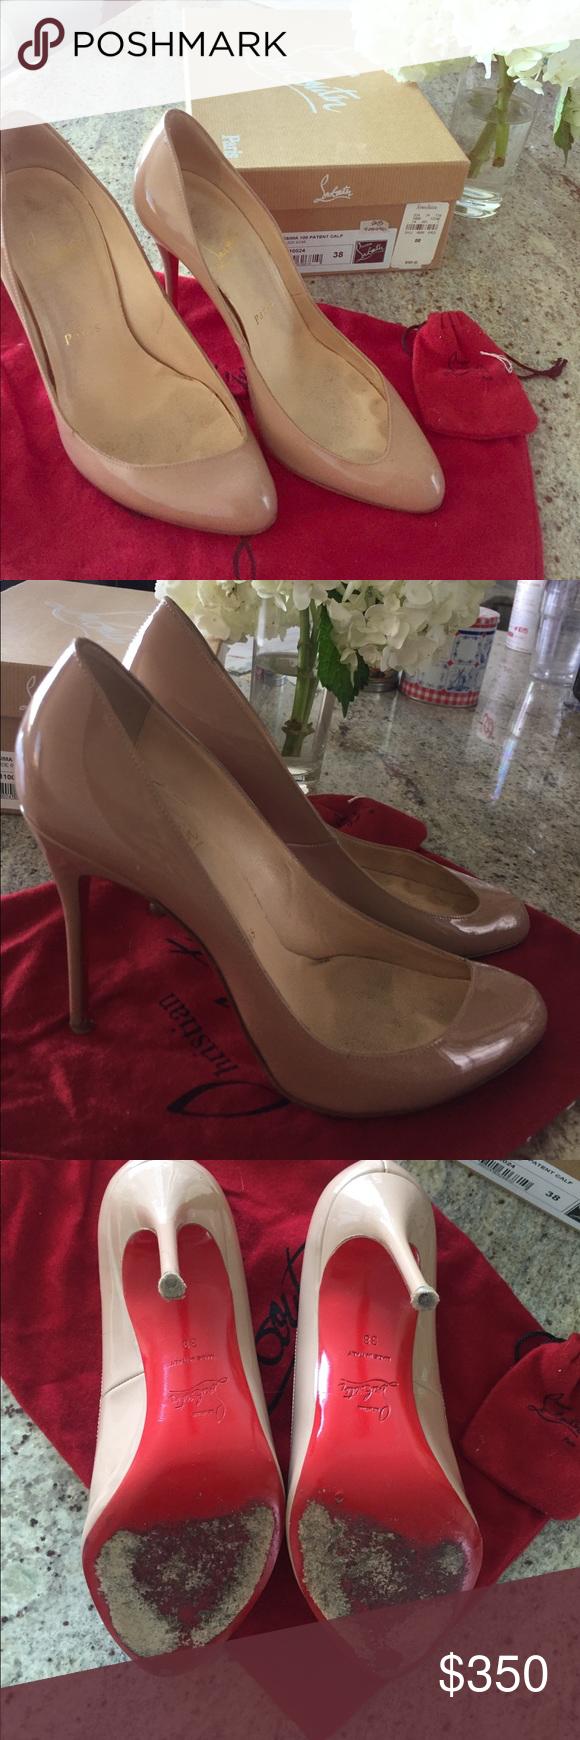 111c16e773a Christian Louboutin Maudissima 100 Patent Calf Nude heels, size 38 ...